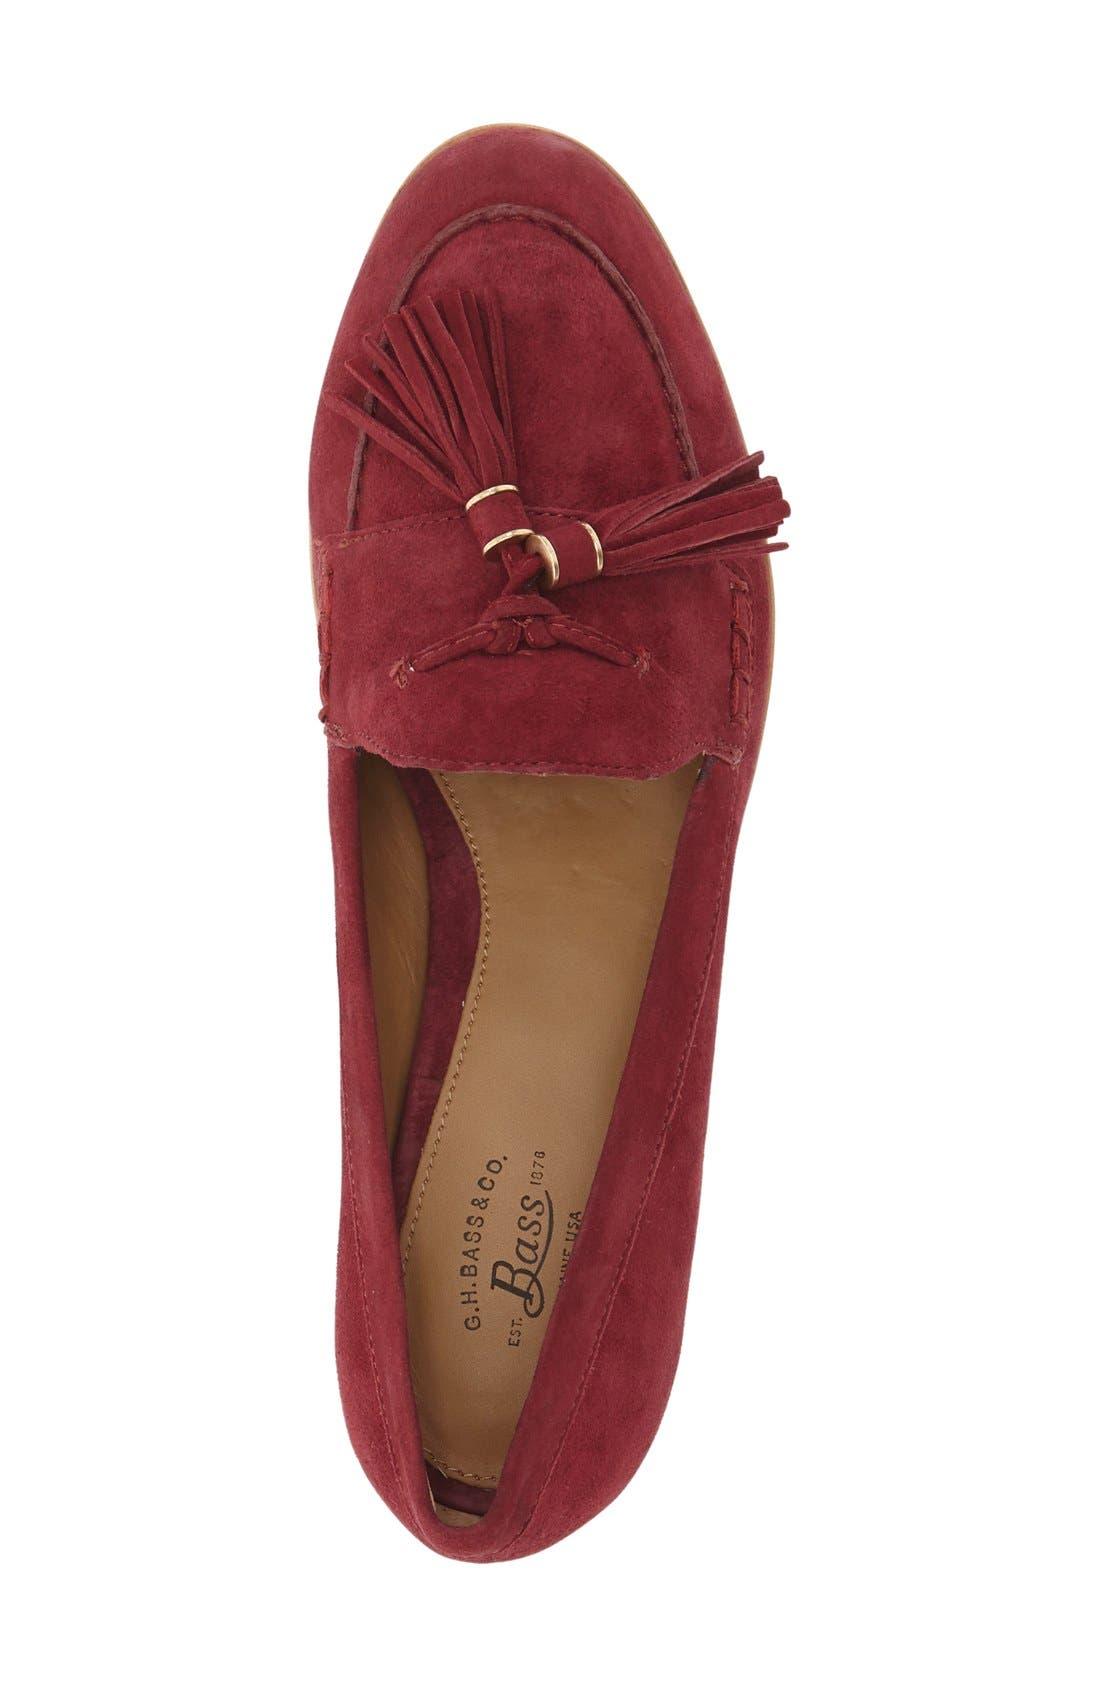 'Estelle' Tassel Loafer,                             Alternate thumbnail 3, color,                             Cherry Red Suede